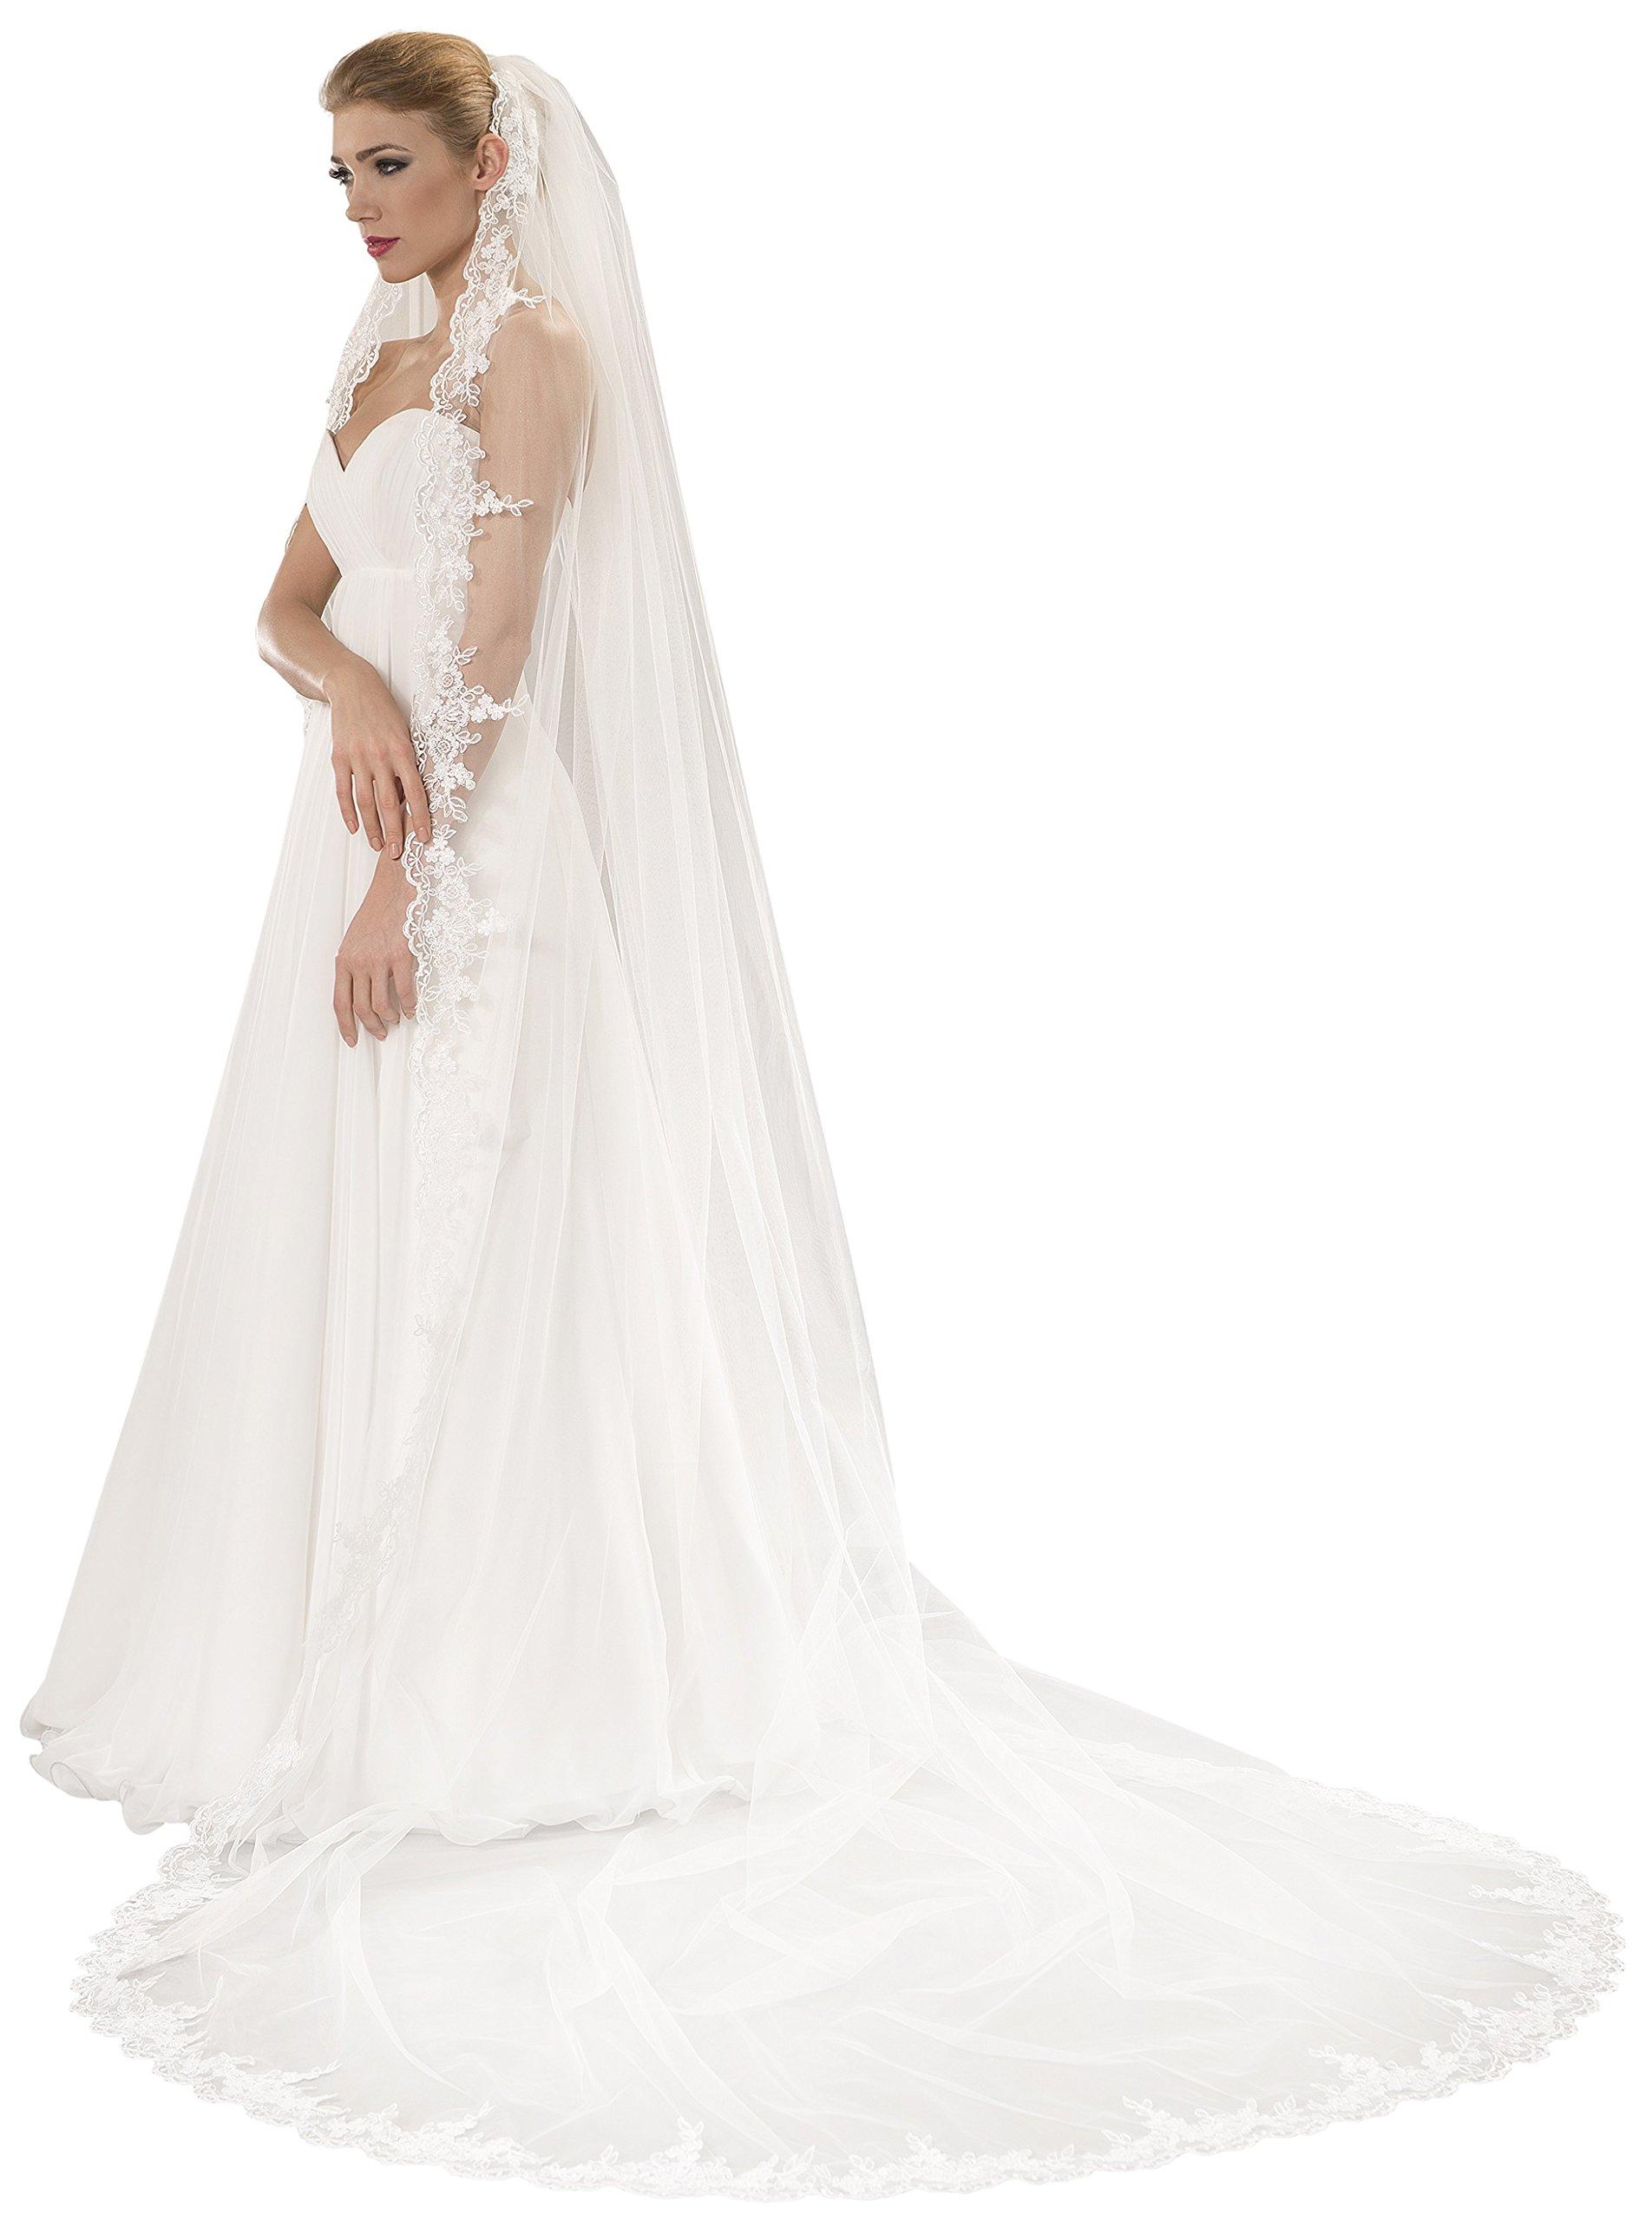 OssaFashion-BridalWear Wedding 1-Tier Cathedral Bridal Veil Decorated With Lace Edge (Ivory)